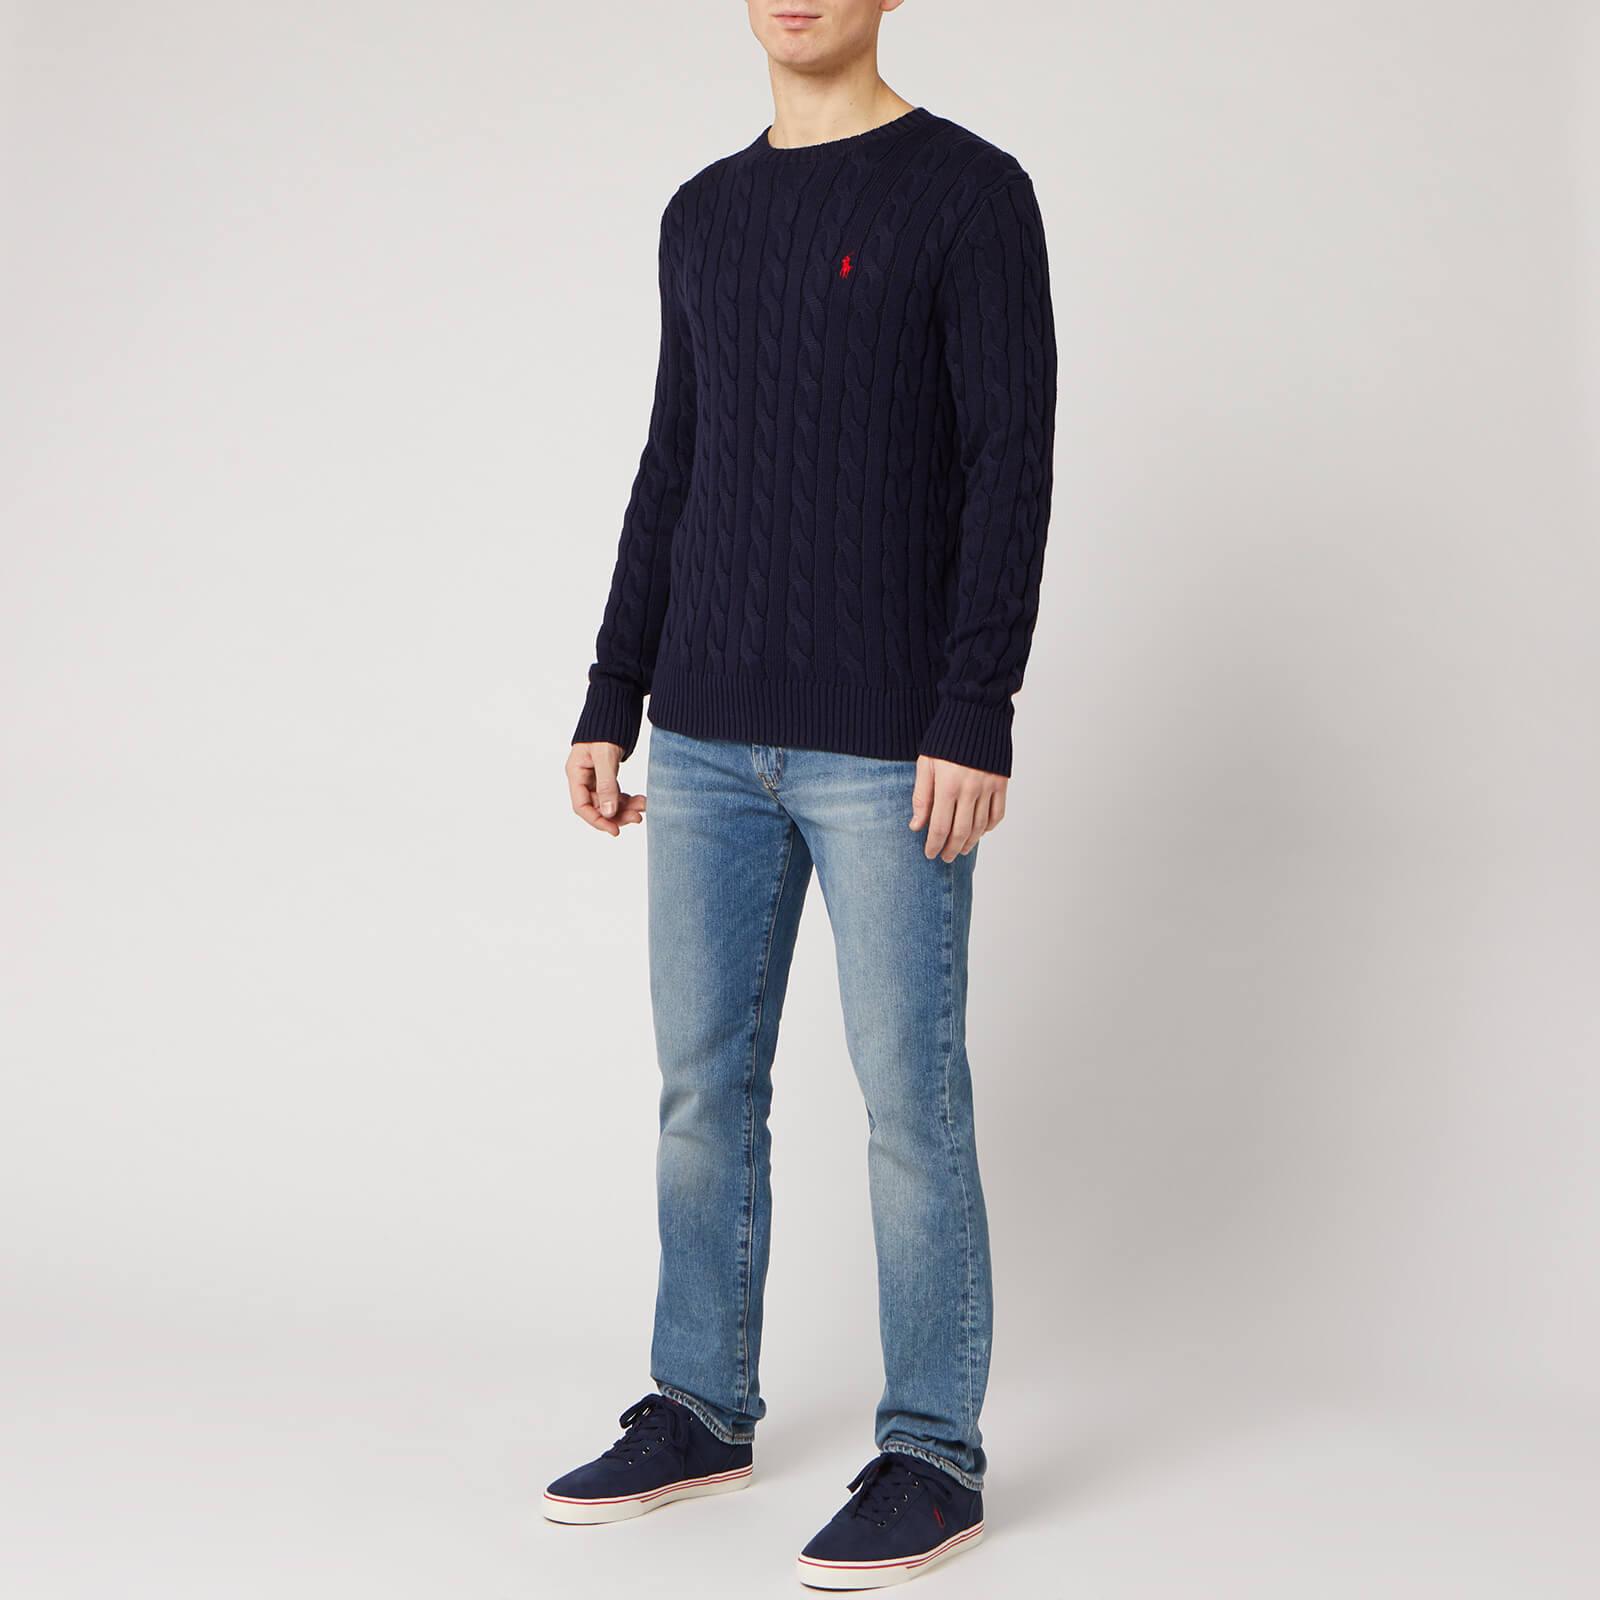 Polo Ralph Lauren Men's Cable Knit Cotton Jumper - Hunter Navy - L 710775885001 General Clothing, Blue